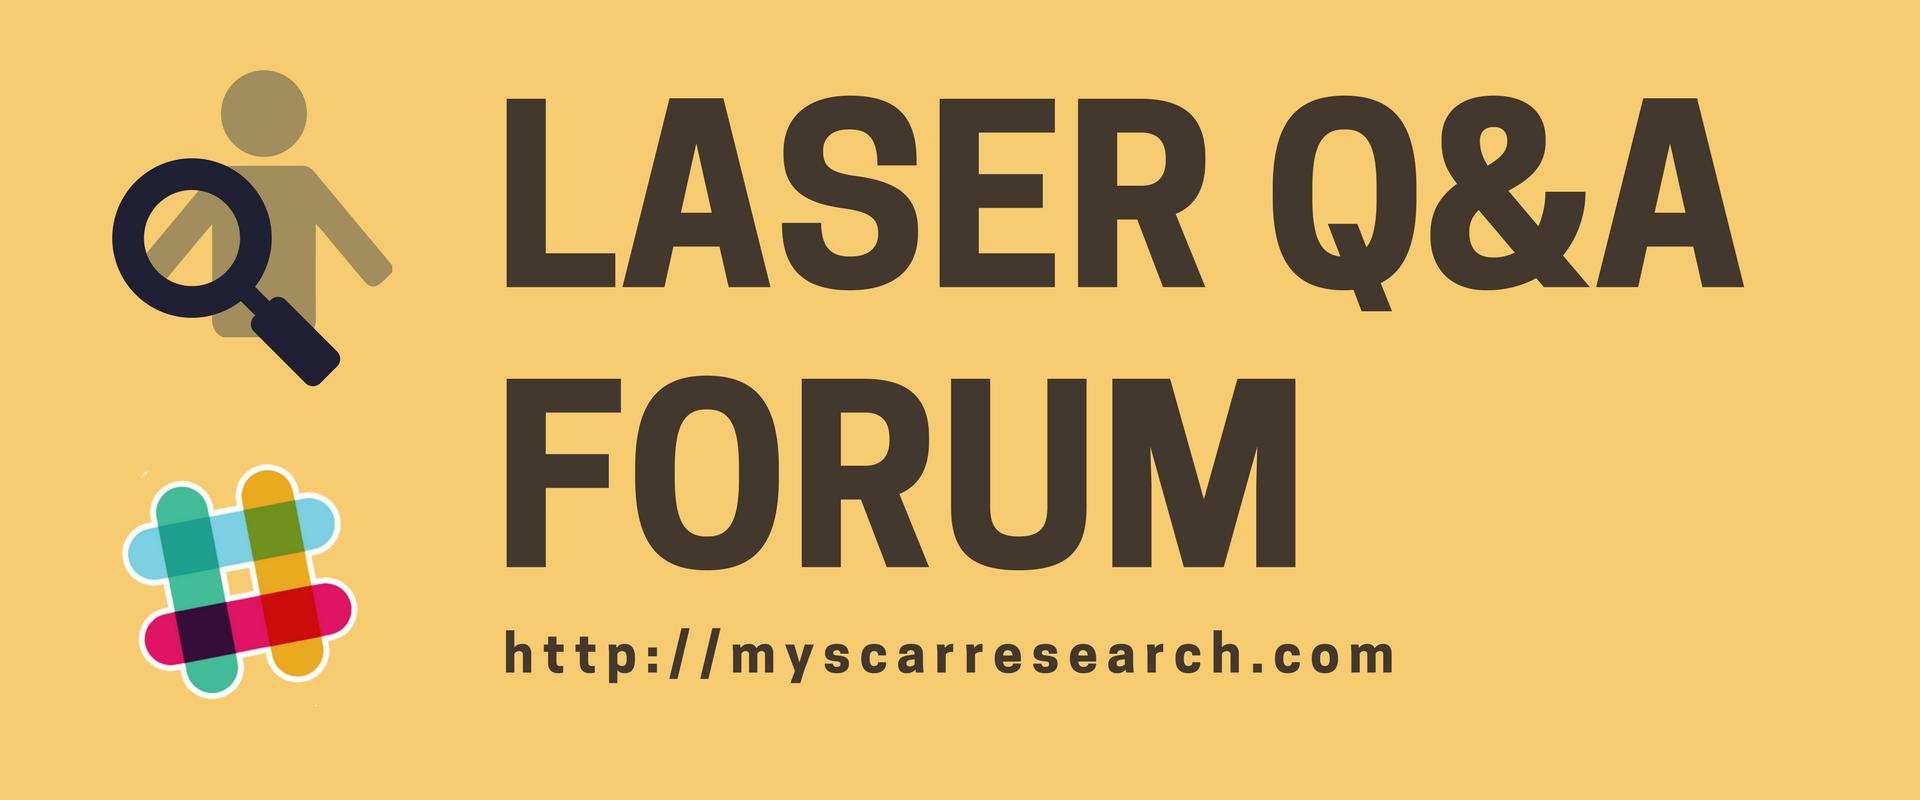 laser-forum-qa.png